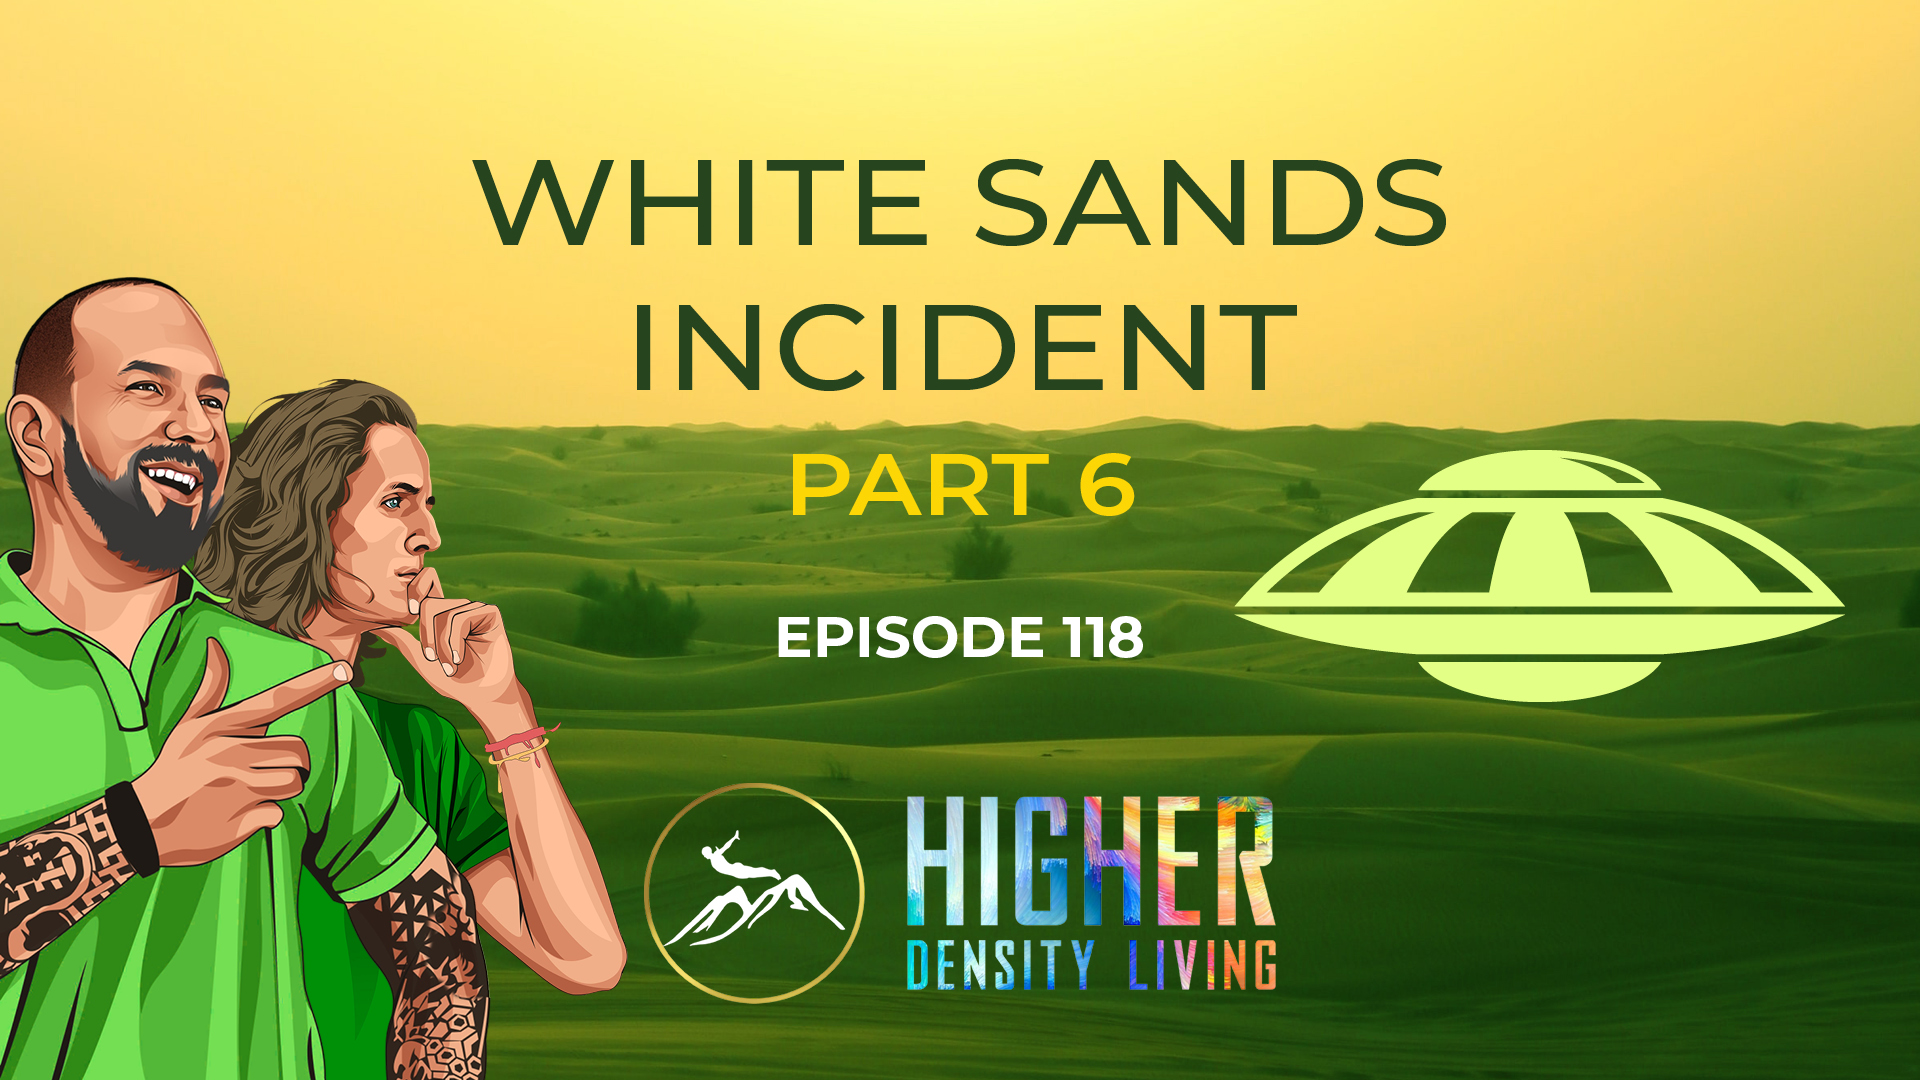 White Sands Incident - Part 6